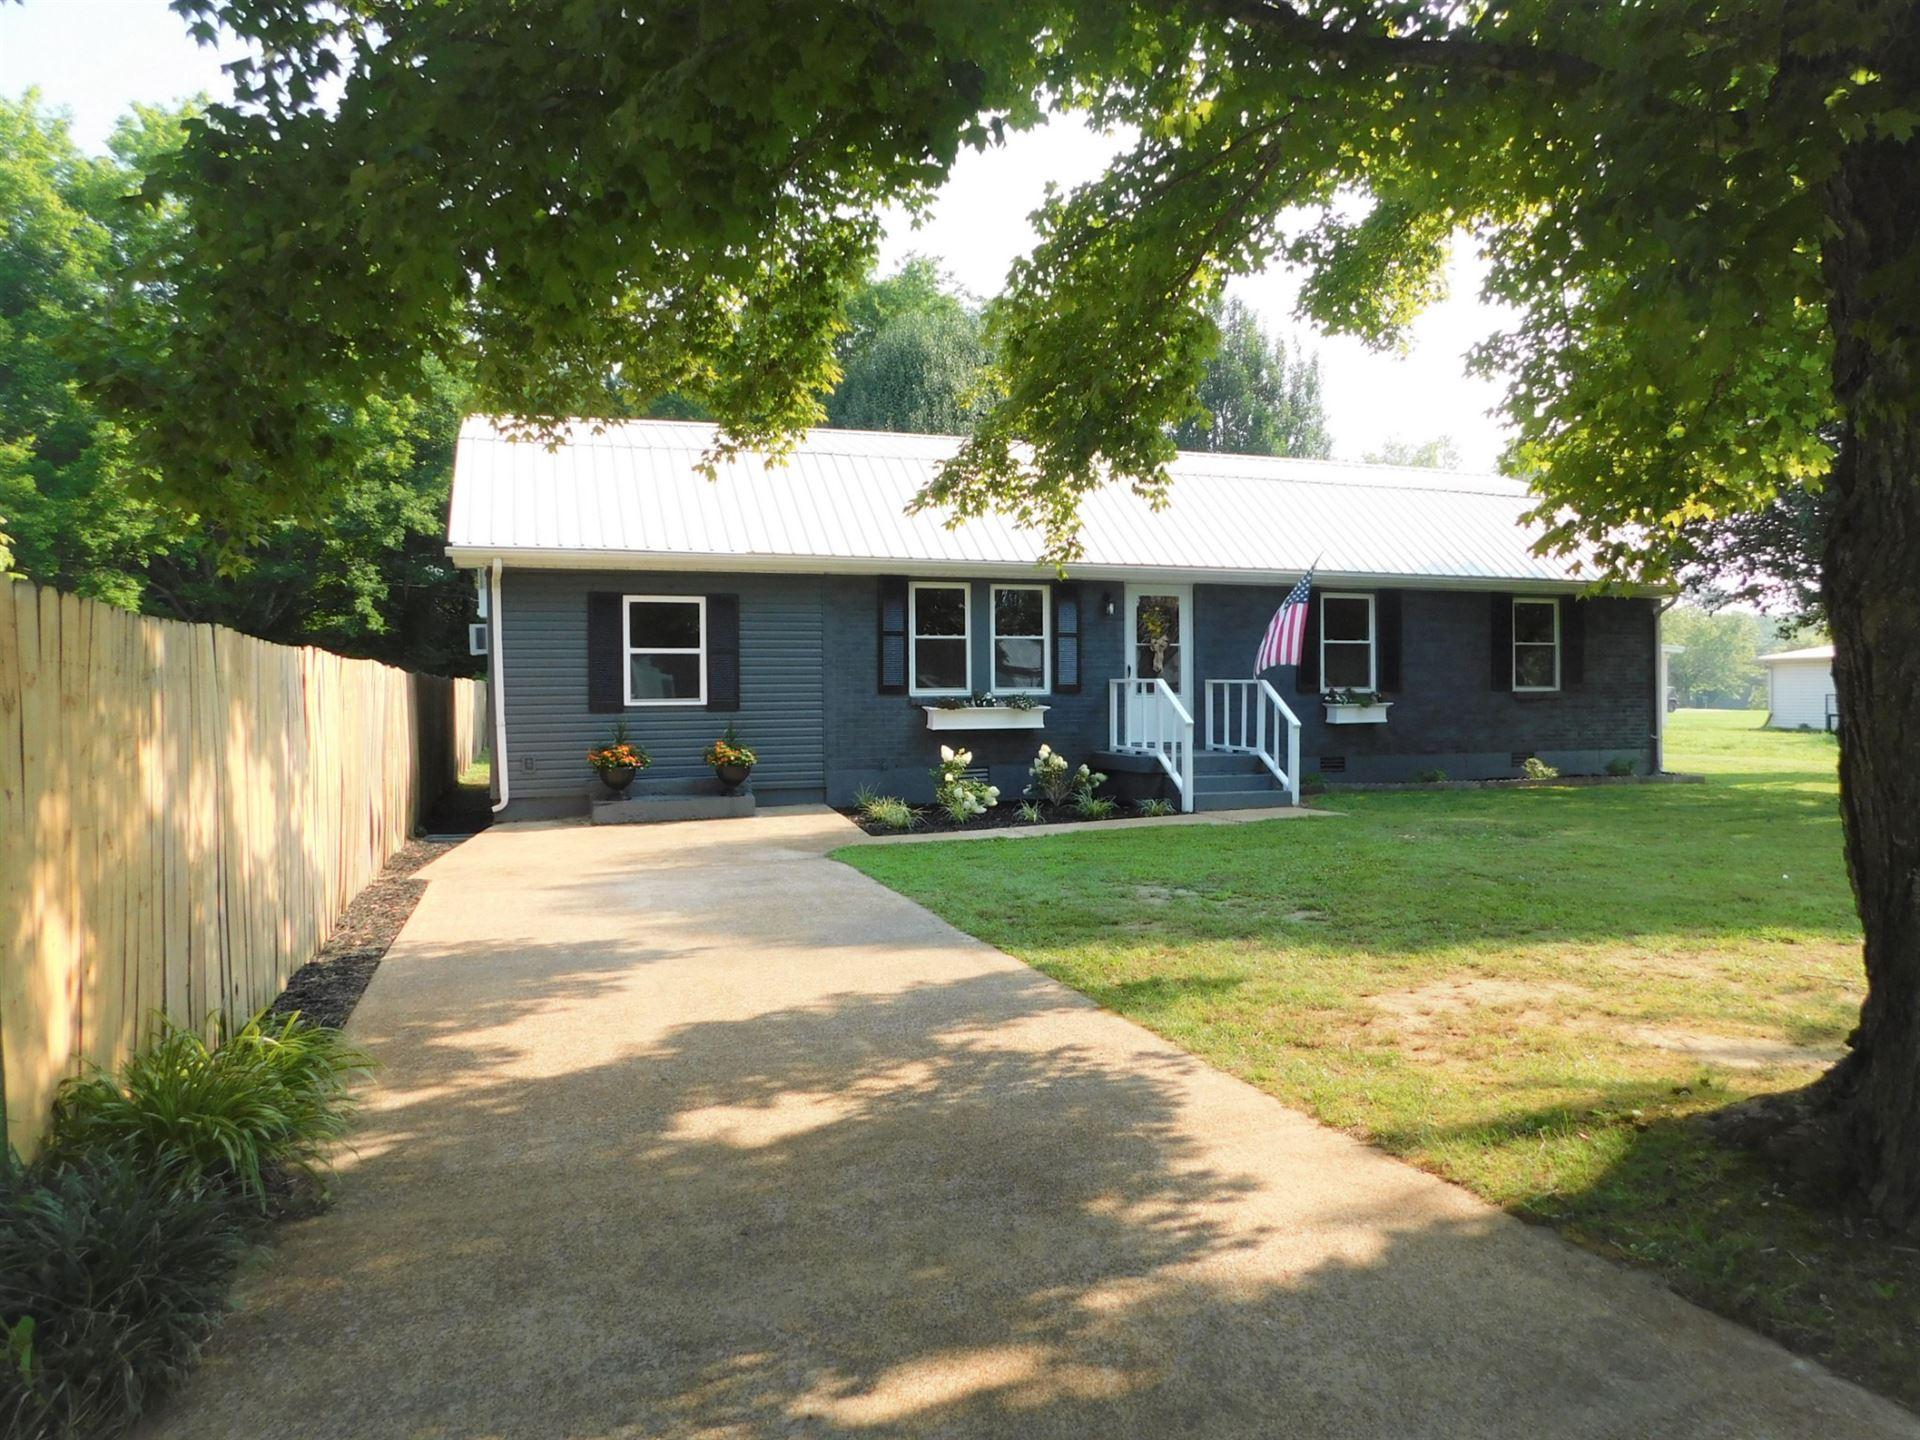 303 Forrest Ave, Hohenwald, TN 38462 - MLS#: 2275354